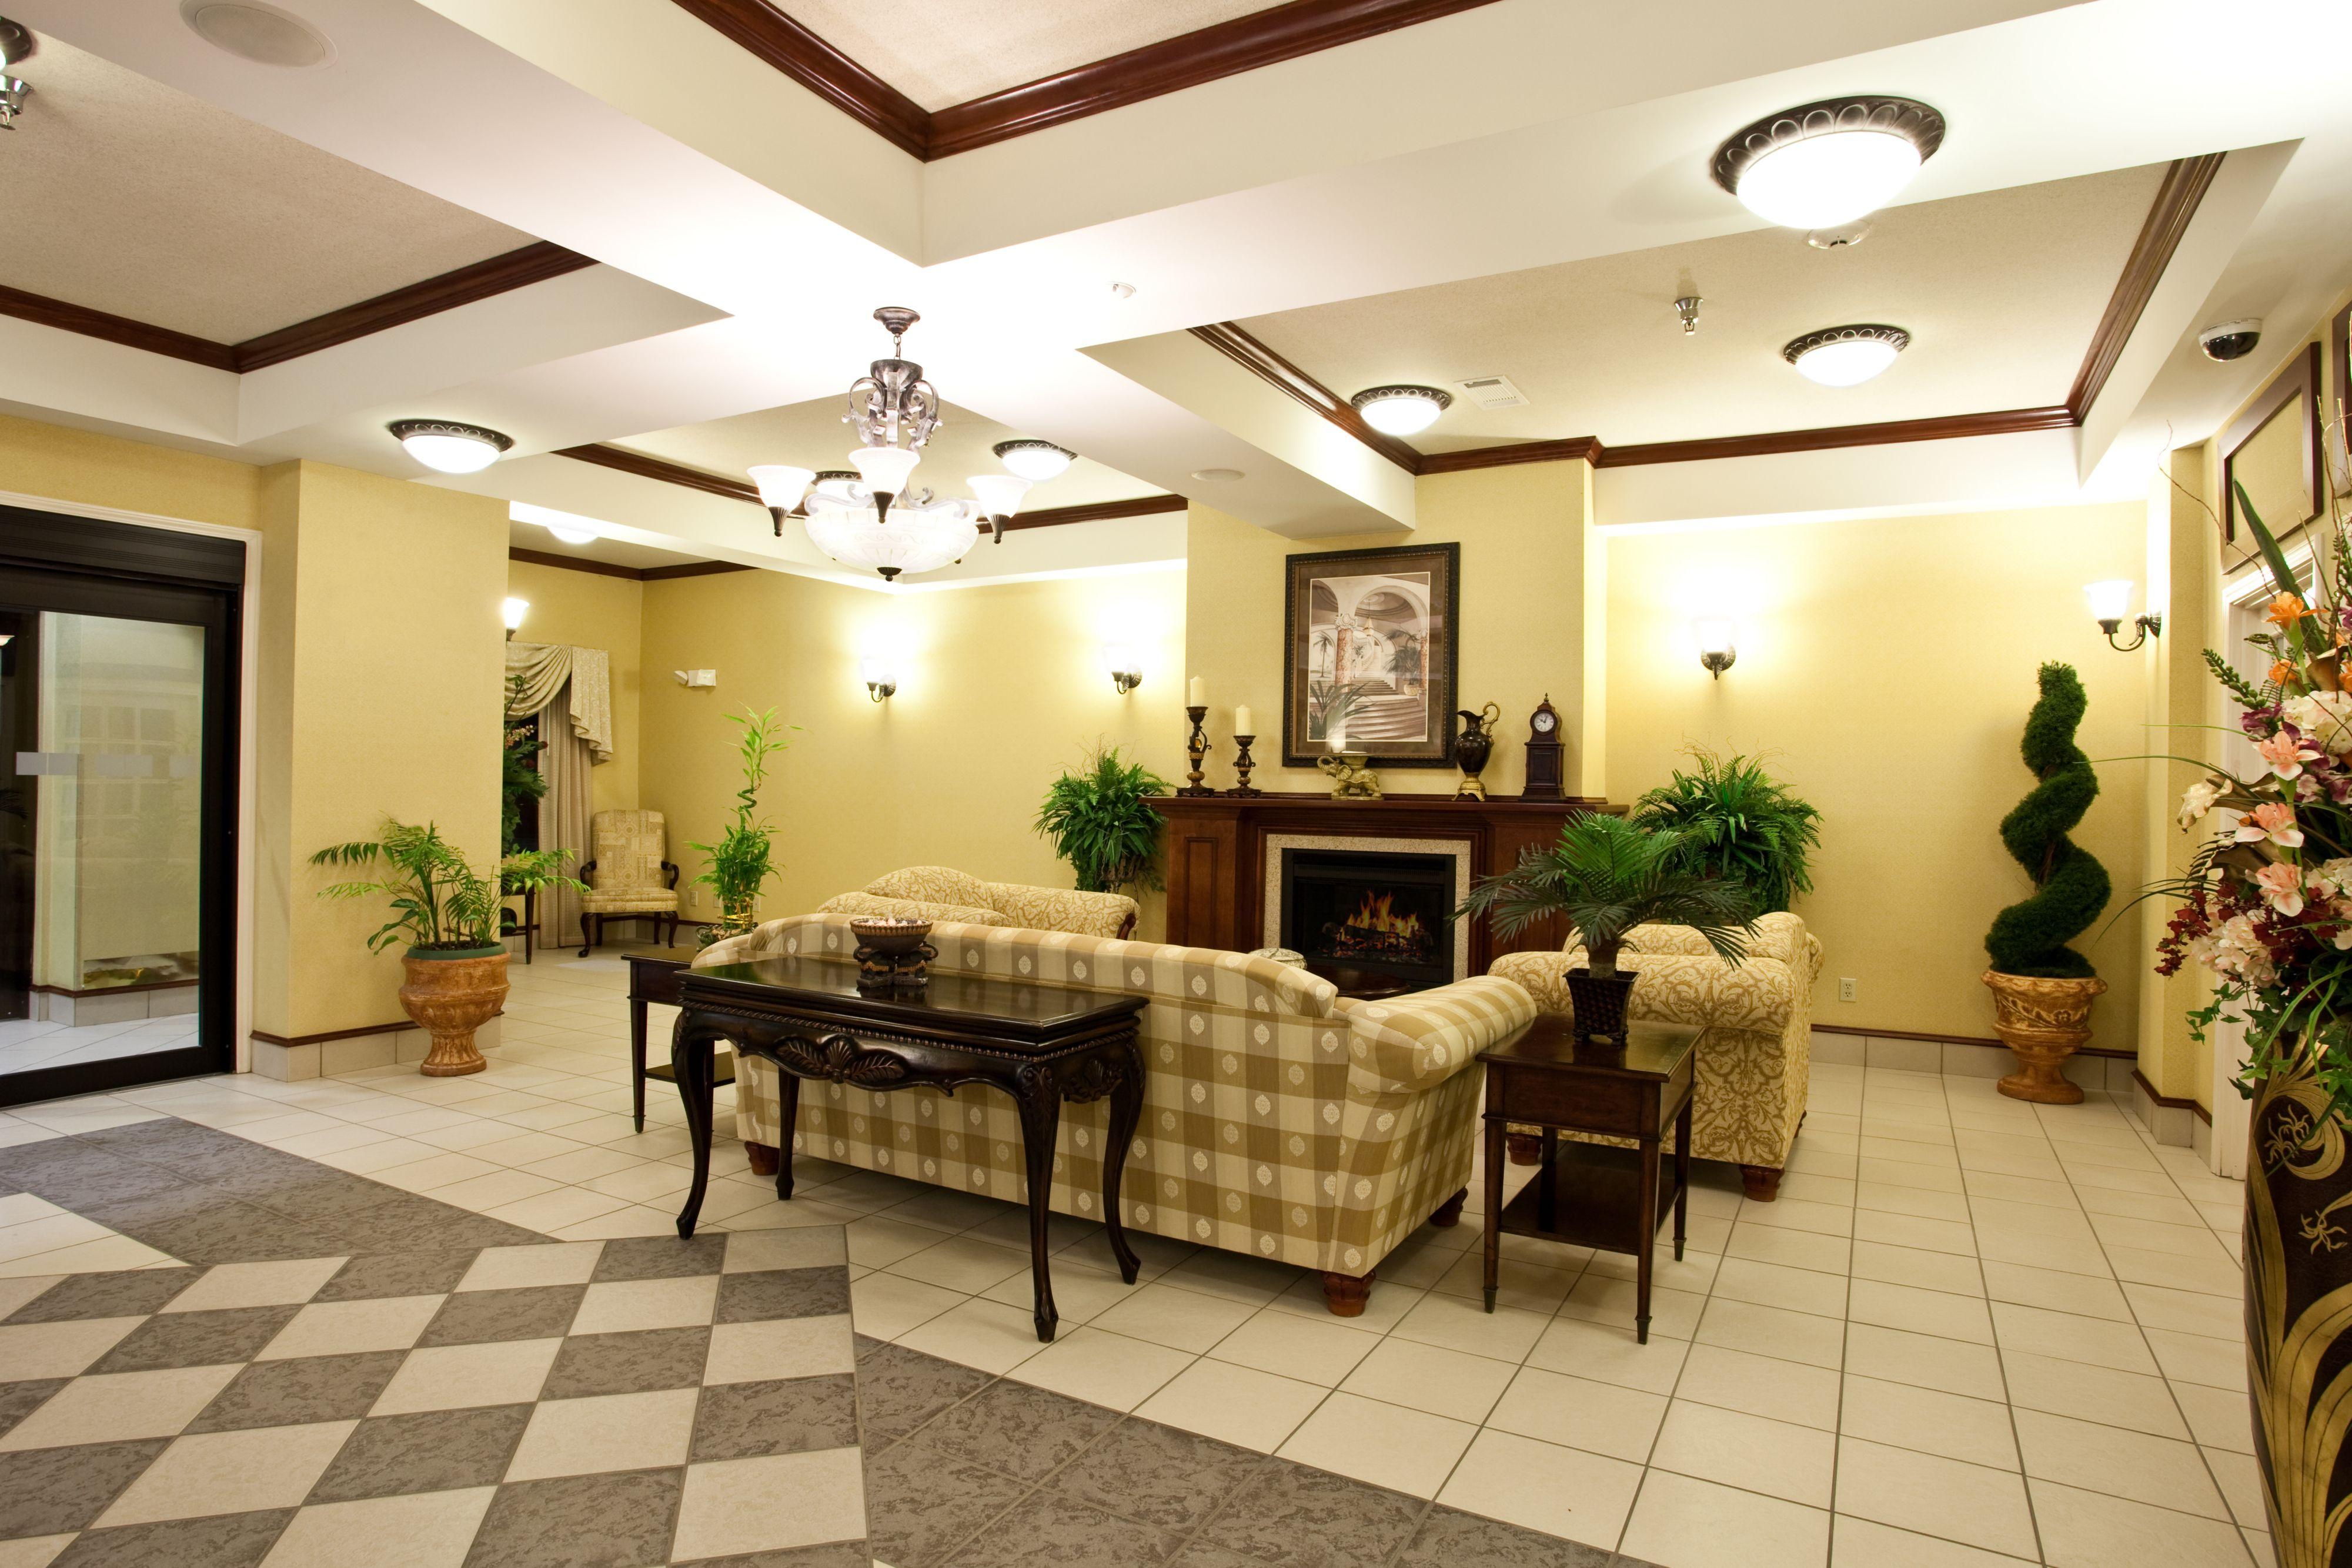 Holiday Inn Express Clanton image 6